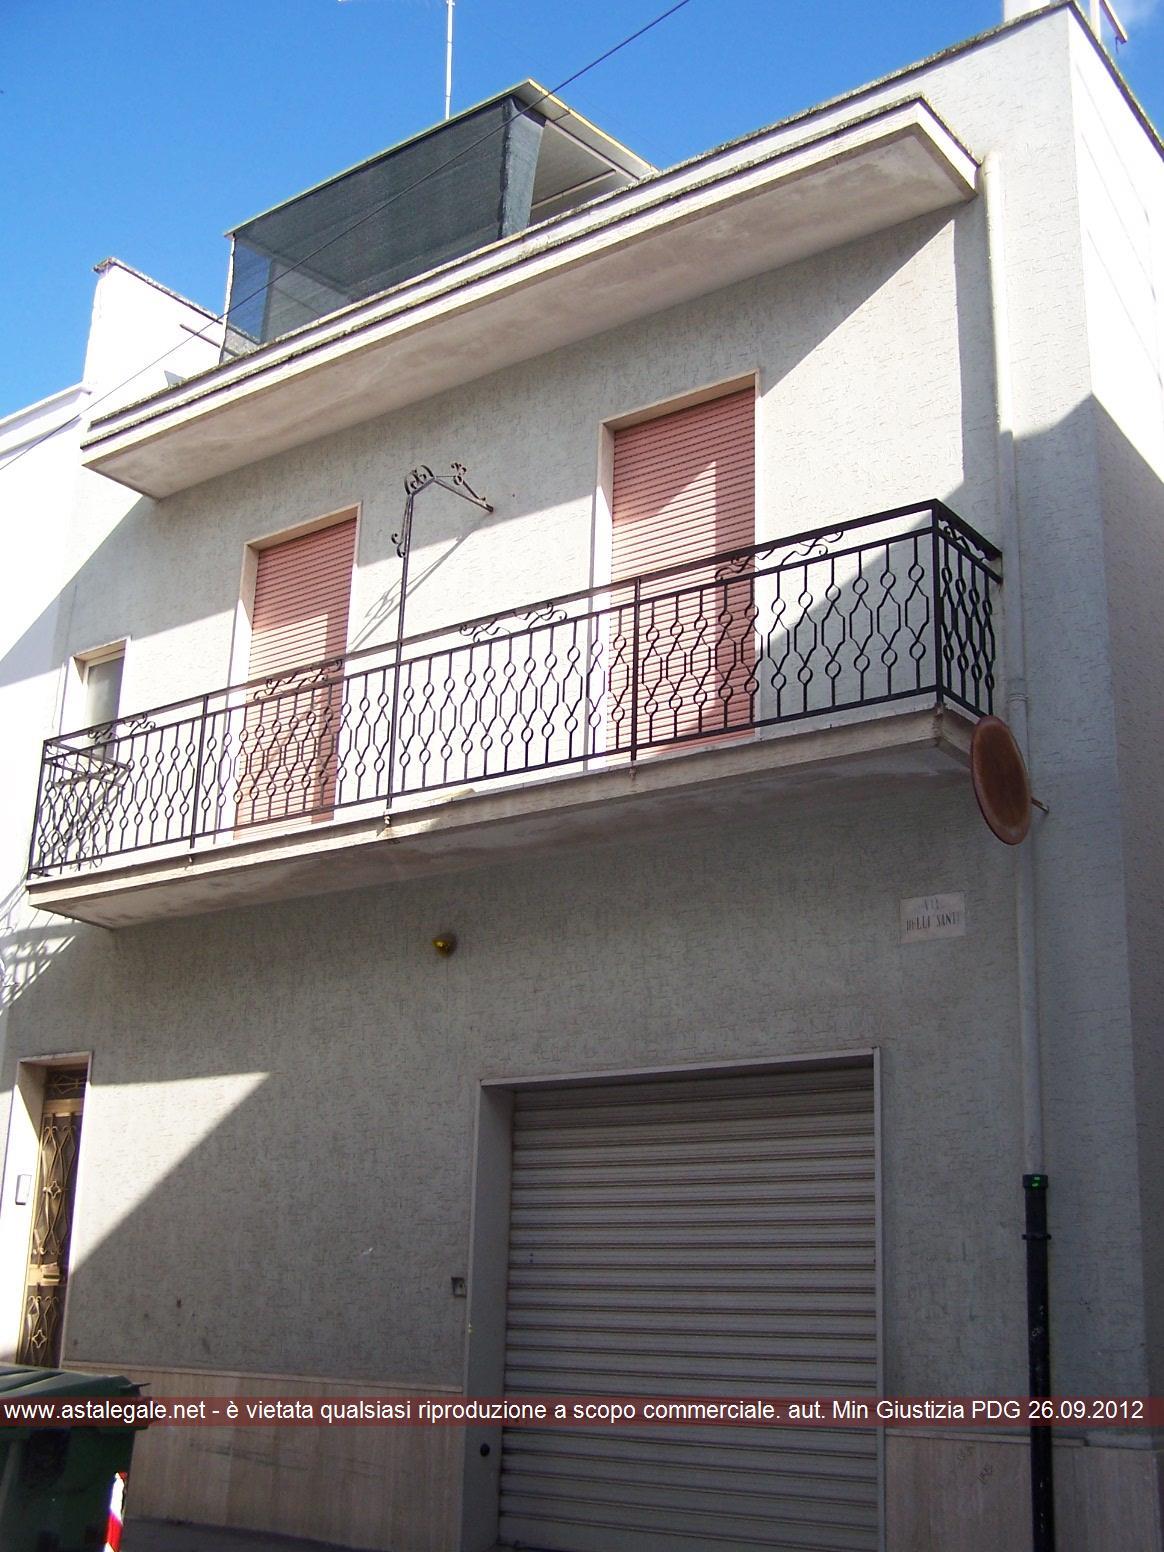 Francavilla Fontana (BR) Via Delli Santi 35